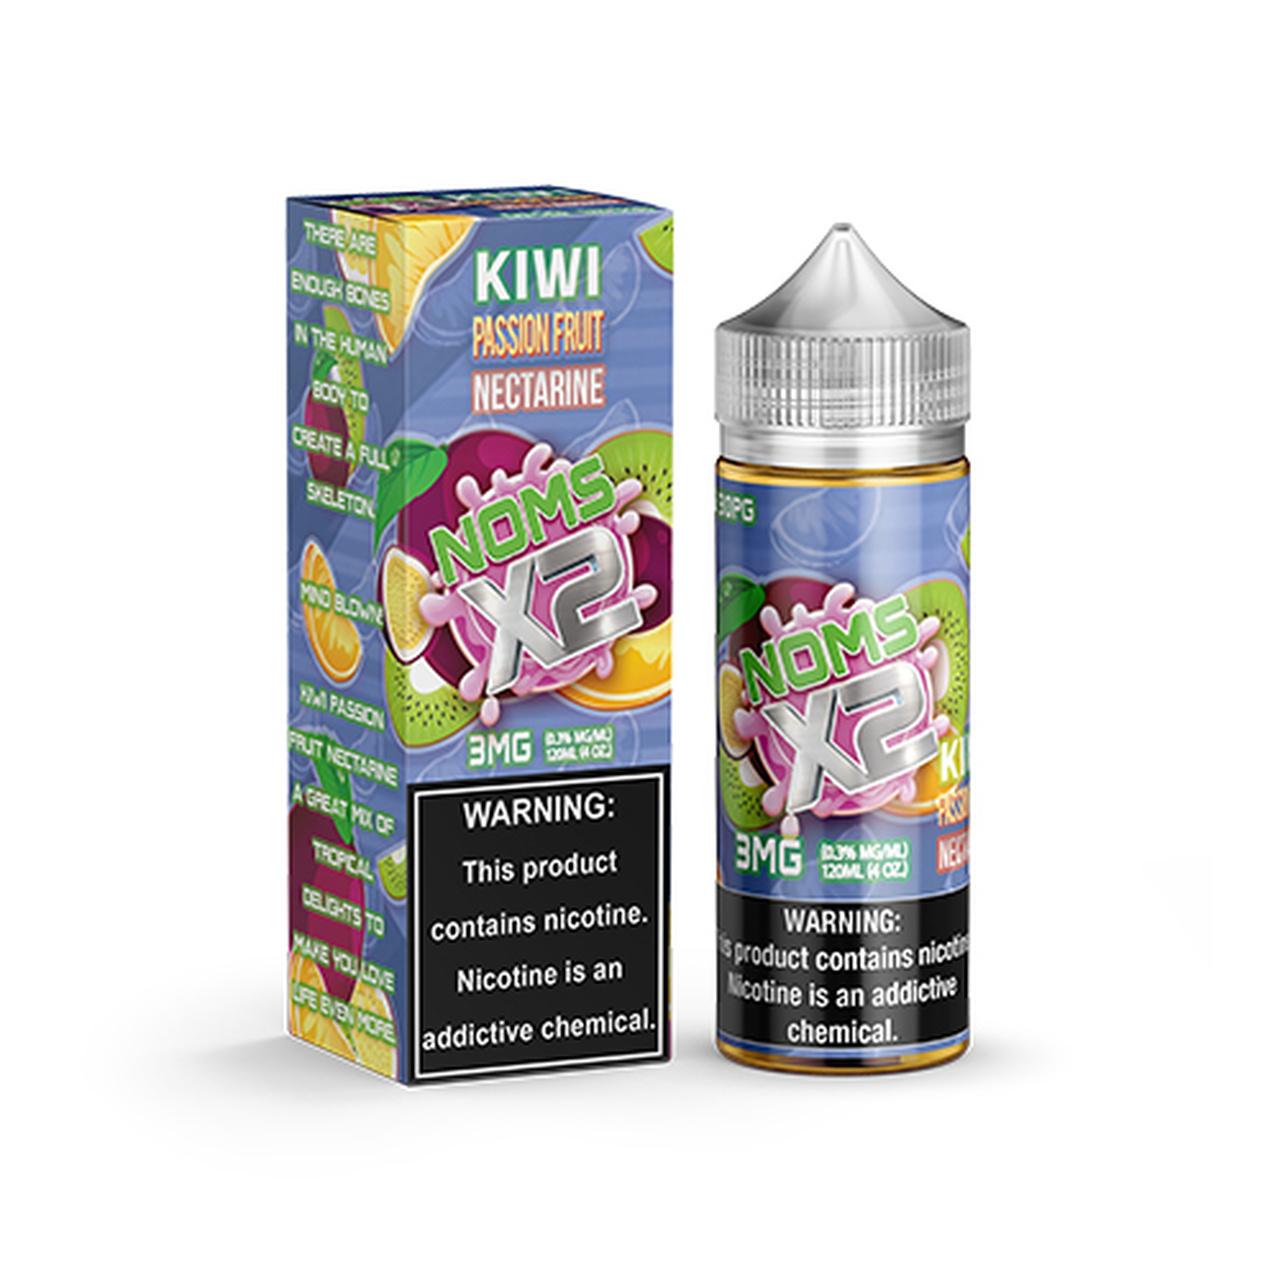 NOMS X2 KIWI PASSION FRUIT NECTARINE by Lotus